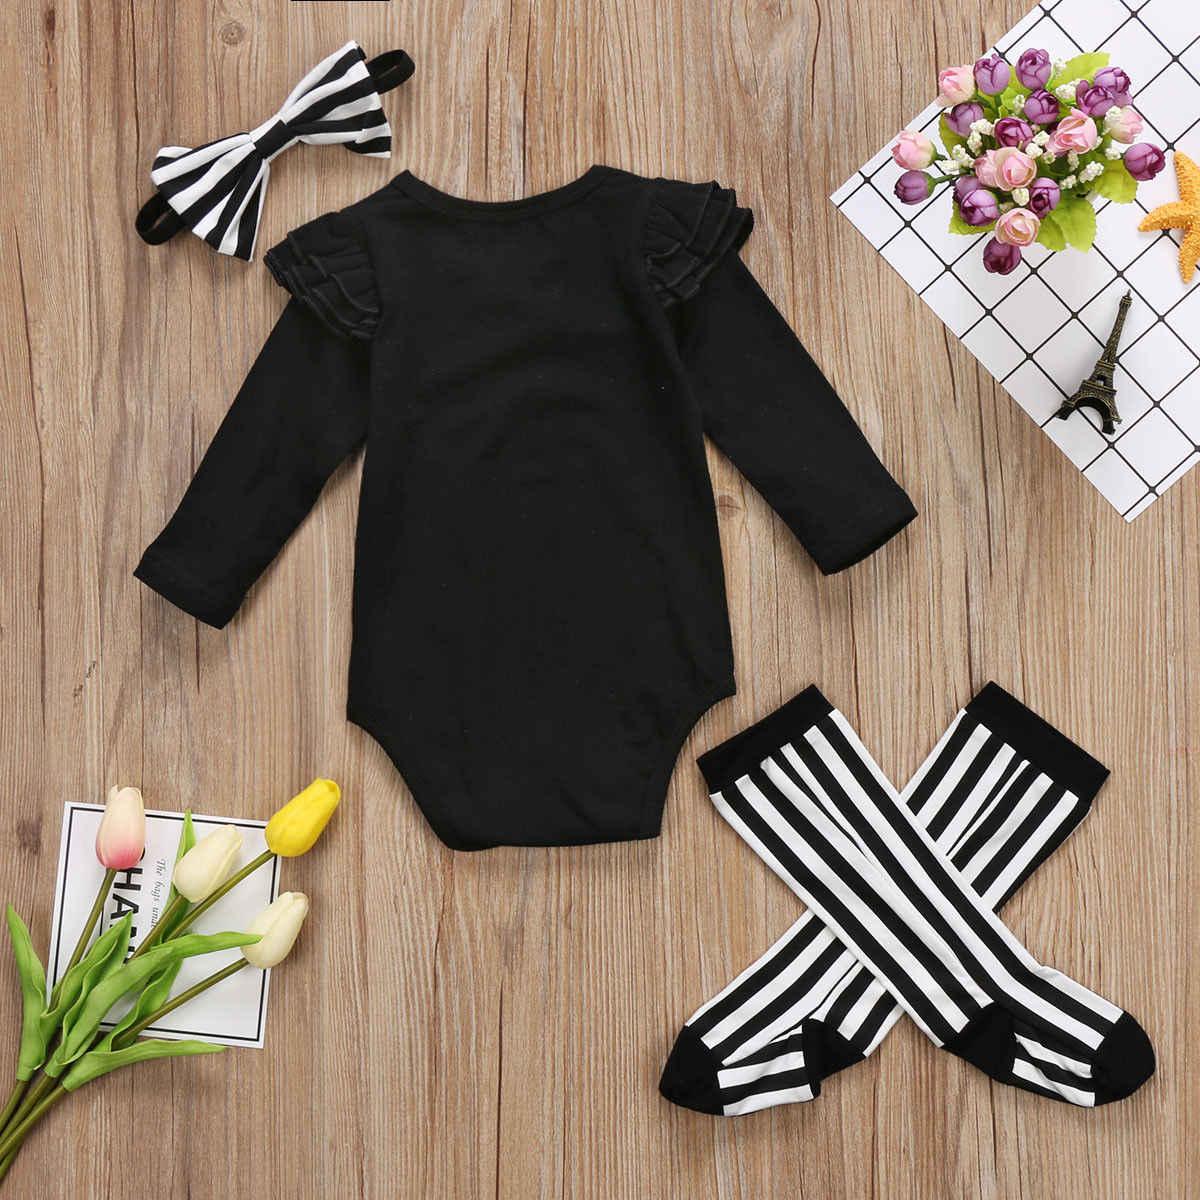 74bc68bf7413b ... Newborn Baby Girls Black Long Sleeve Casual Bodysuit Leggings Socks  Headband Outfits Set Lucky Child Clothes ...